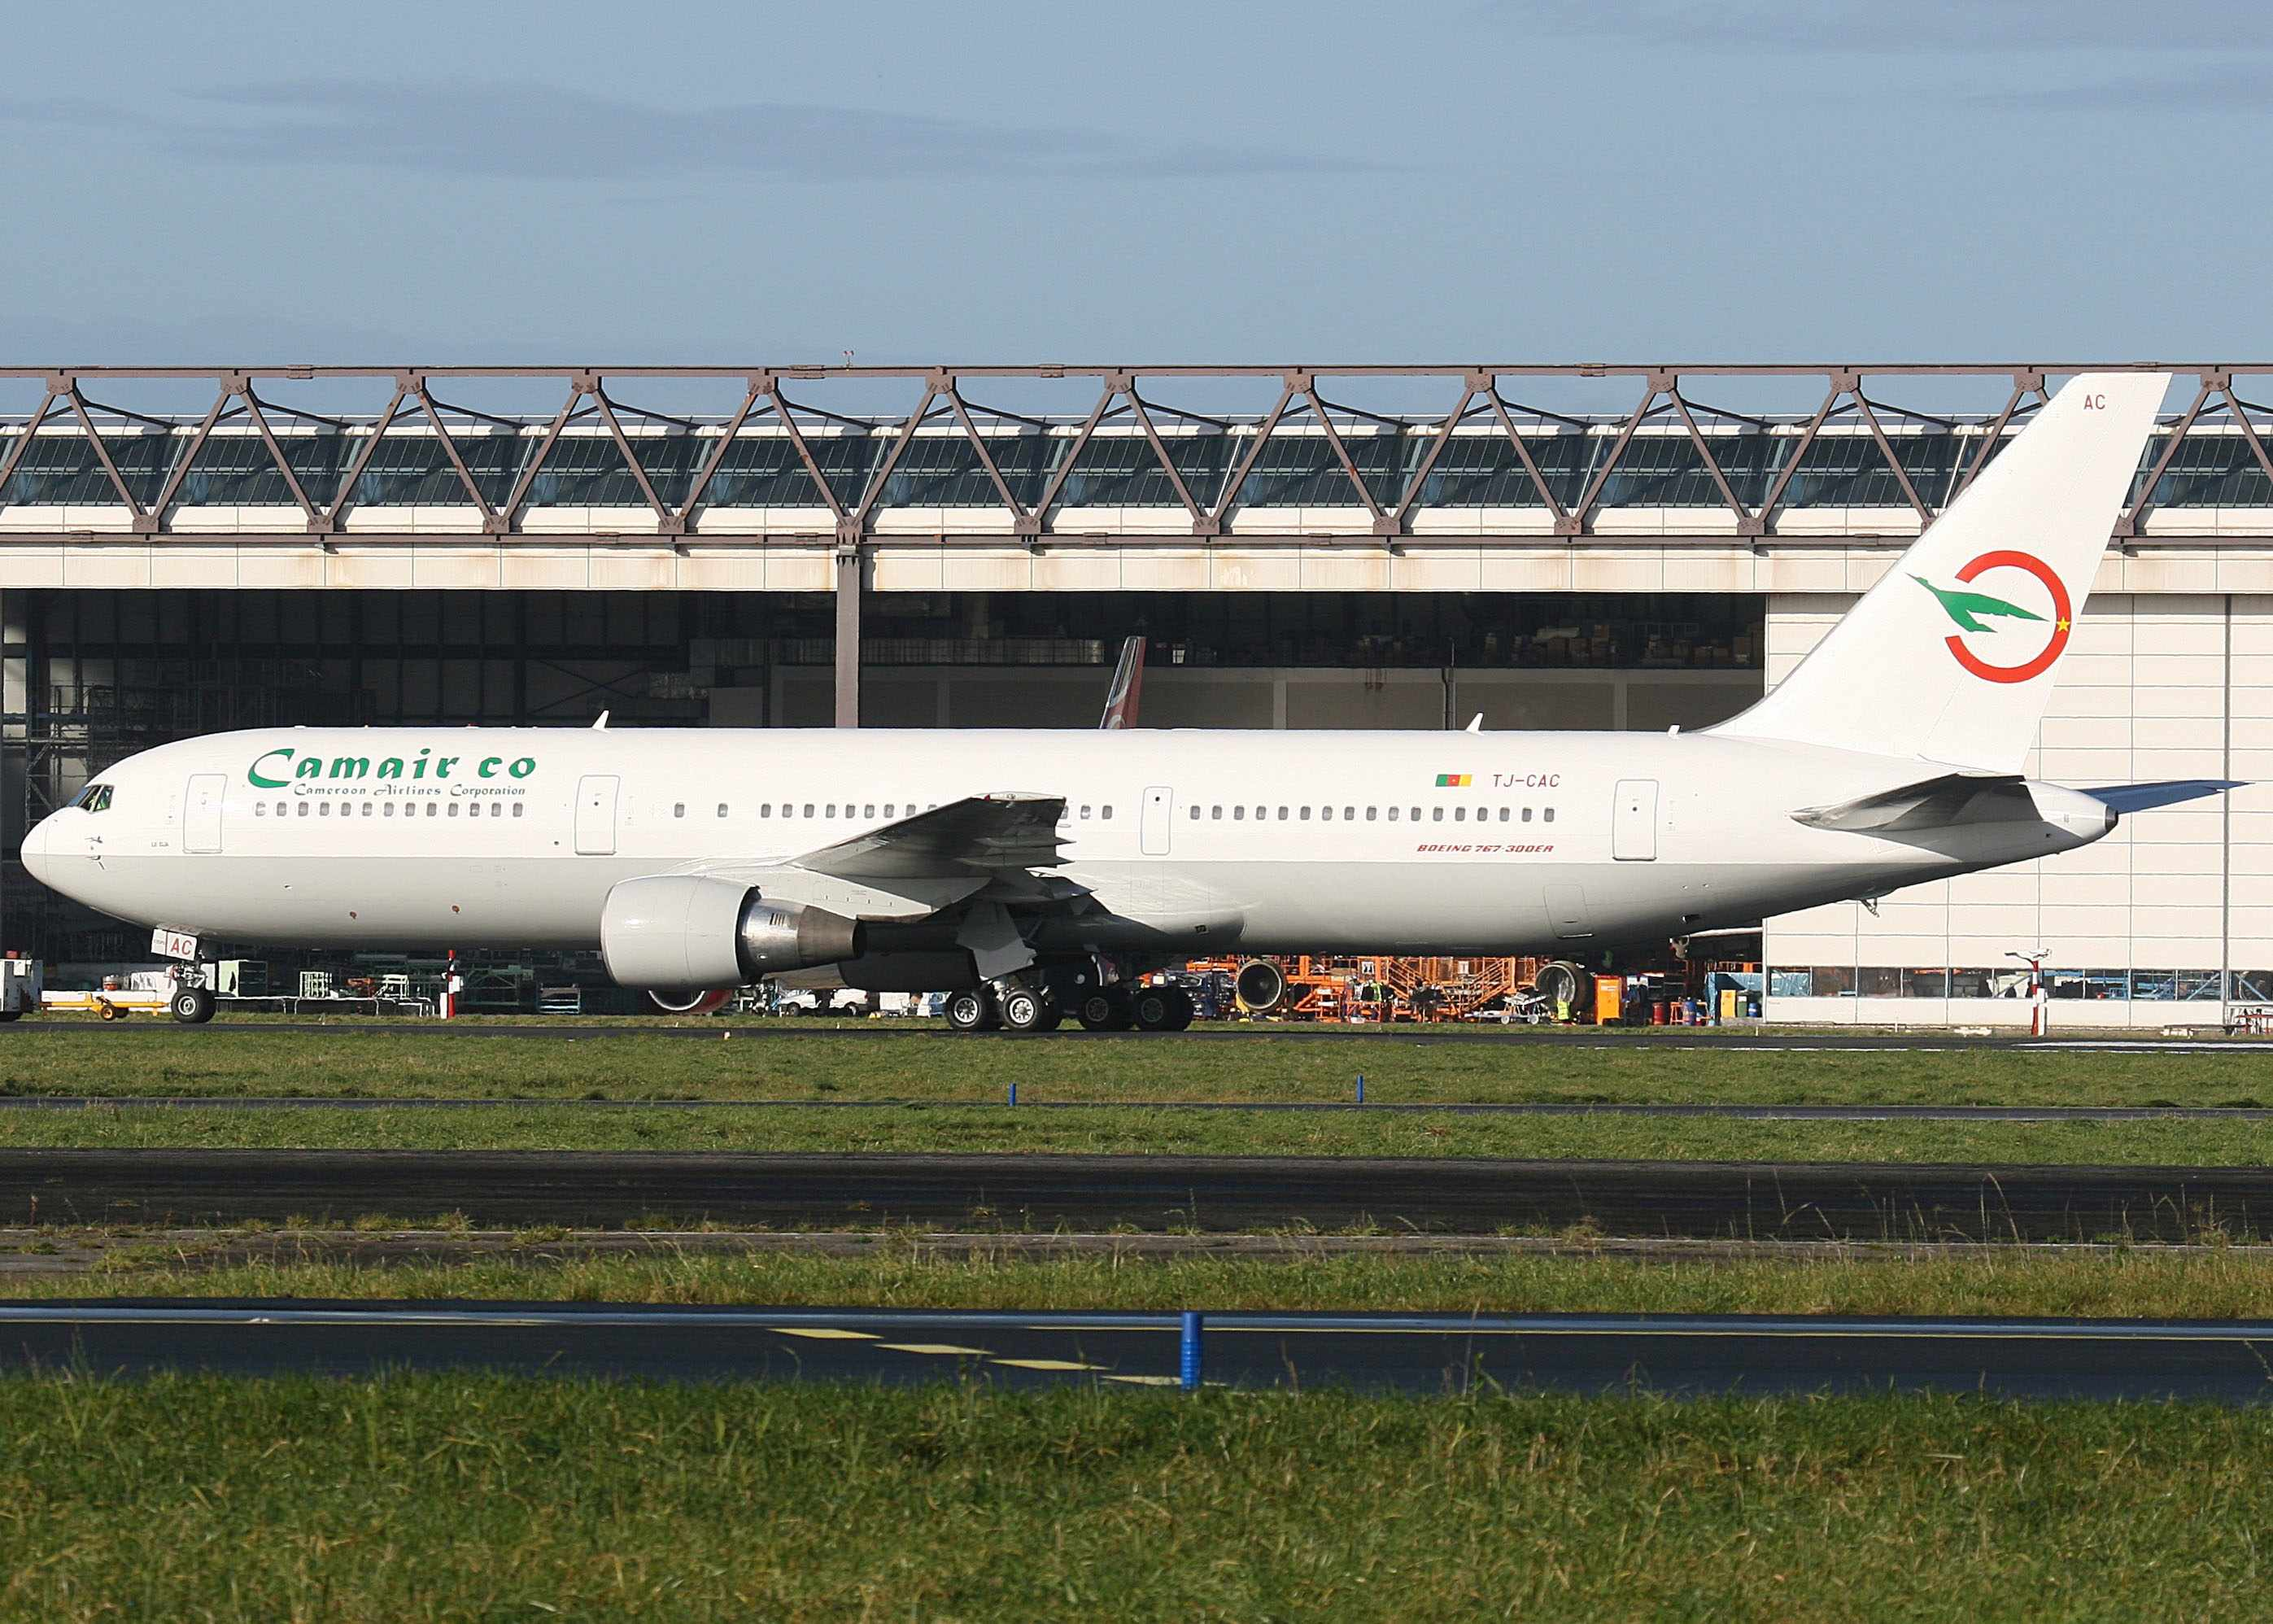 Camair co 767-300 TJ-CAC (09)(Grd) SNN (TV)(LR)